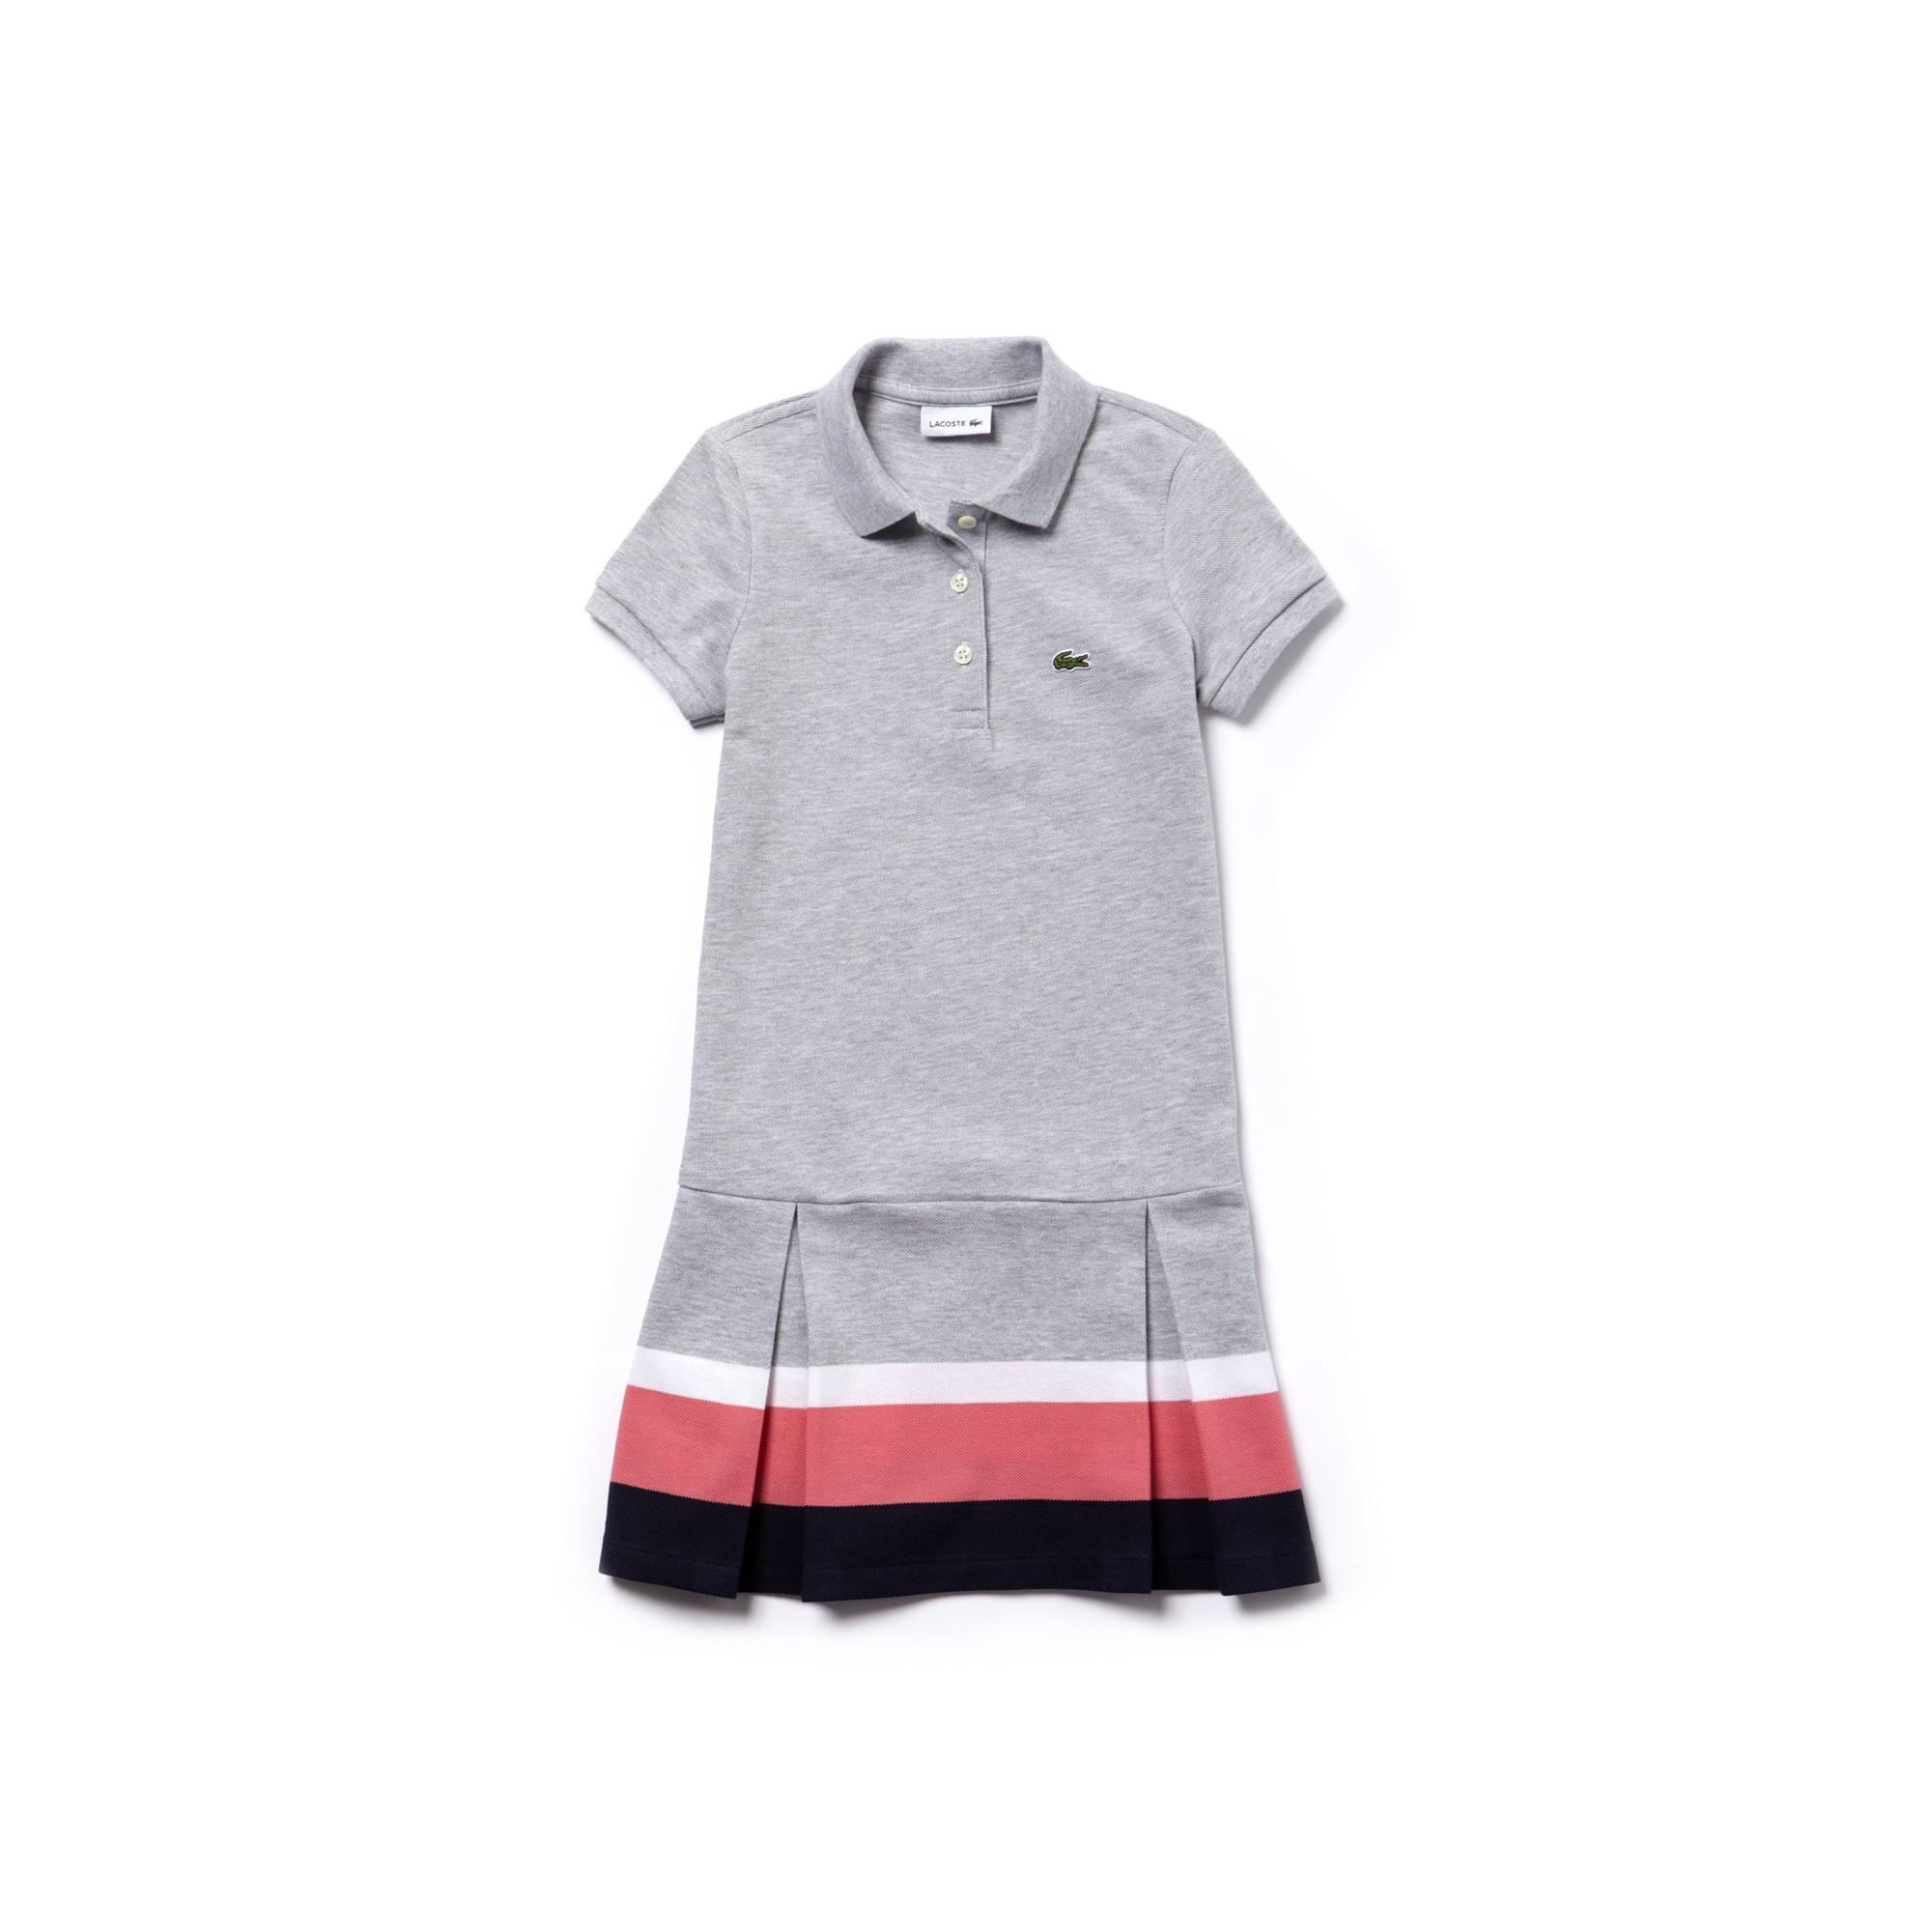 Mädchen-Polokleid aus Petit Piqué mit Faltenlegung